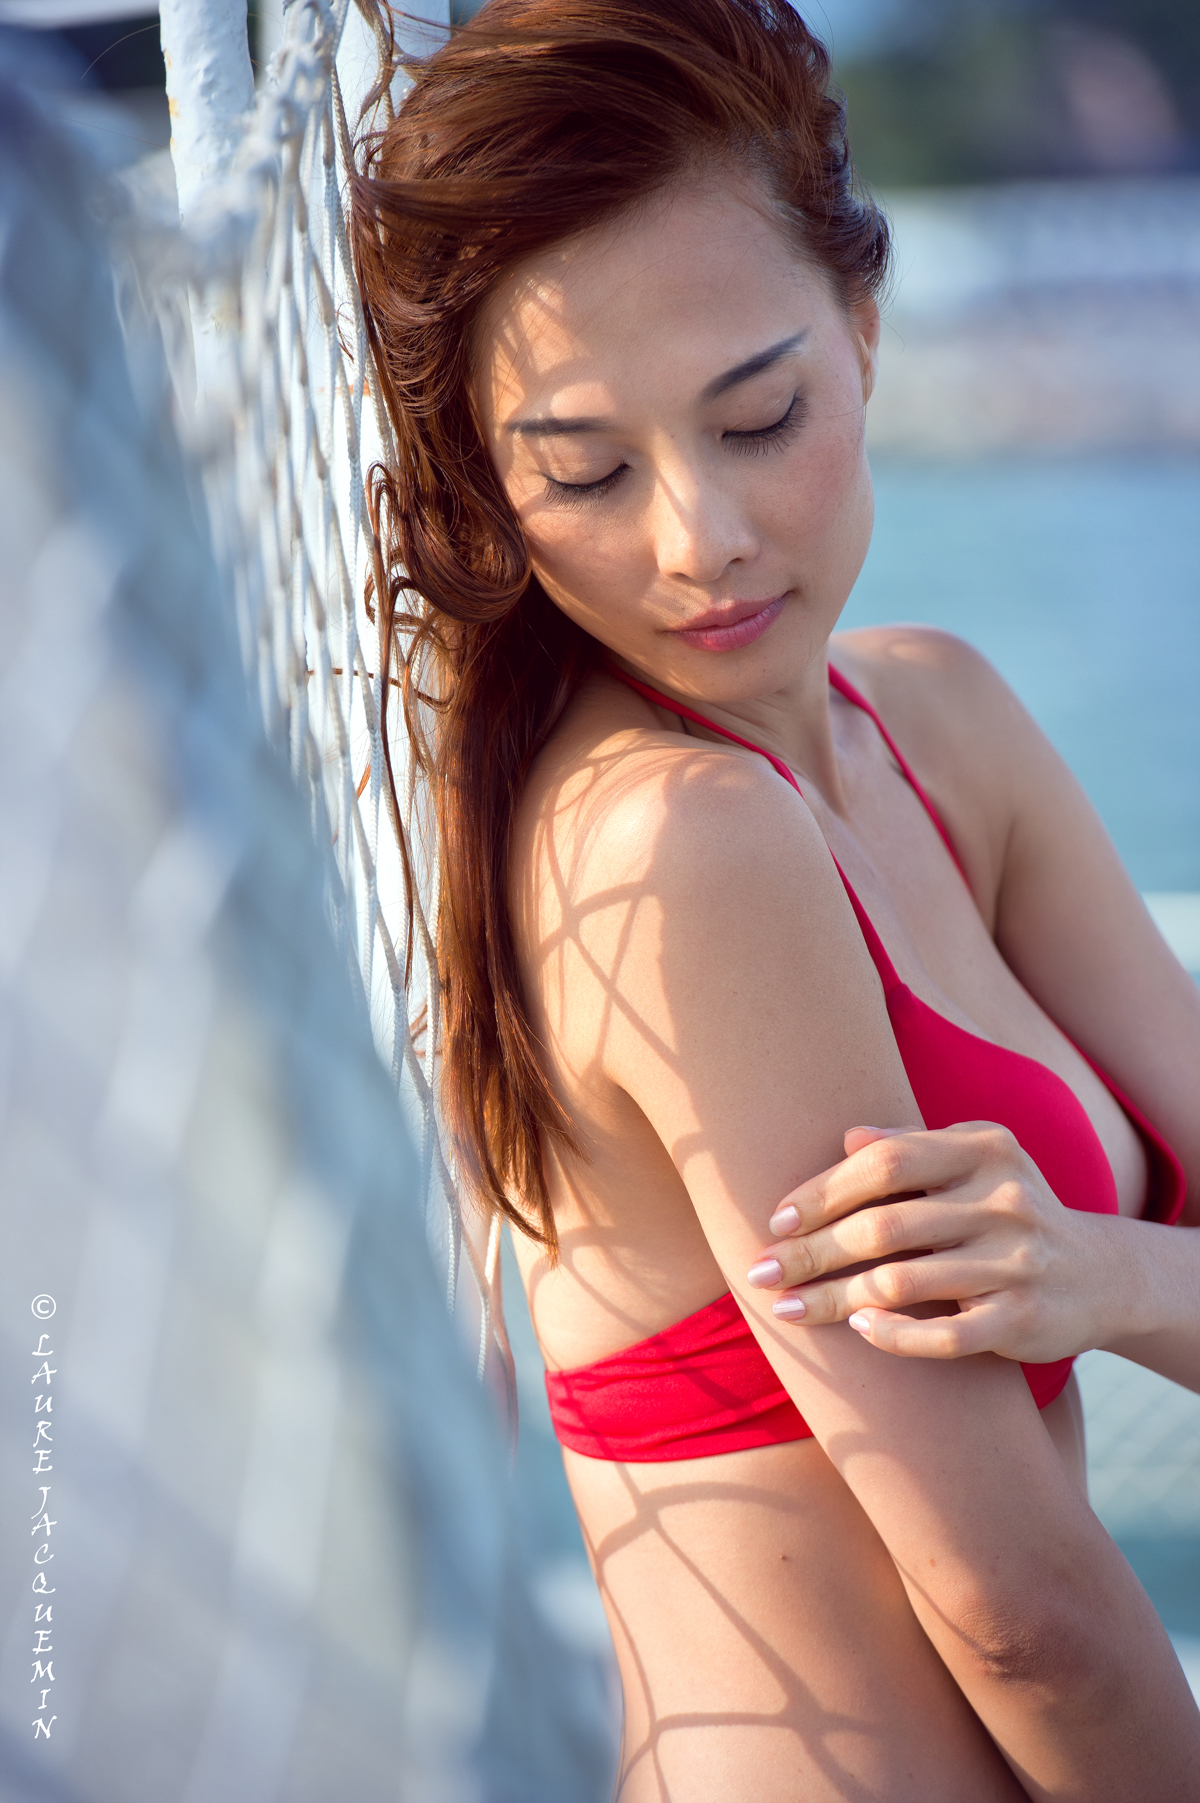 modele shooting venice photographer laure jacquemin (15)